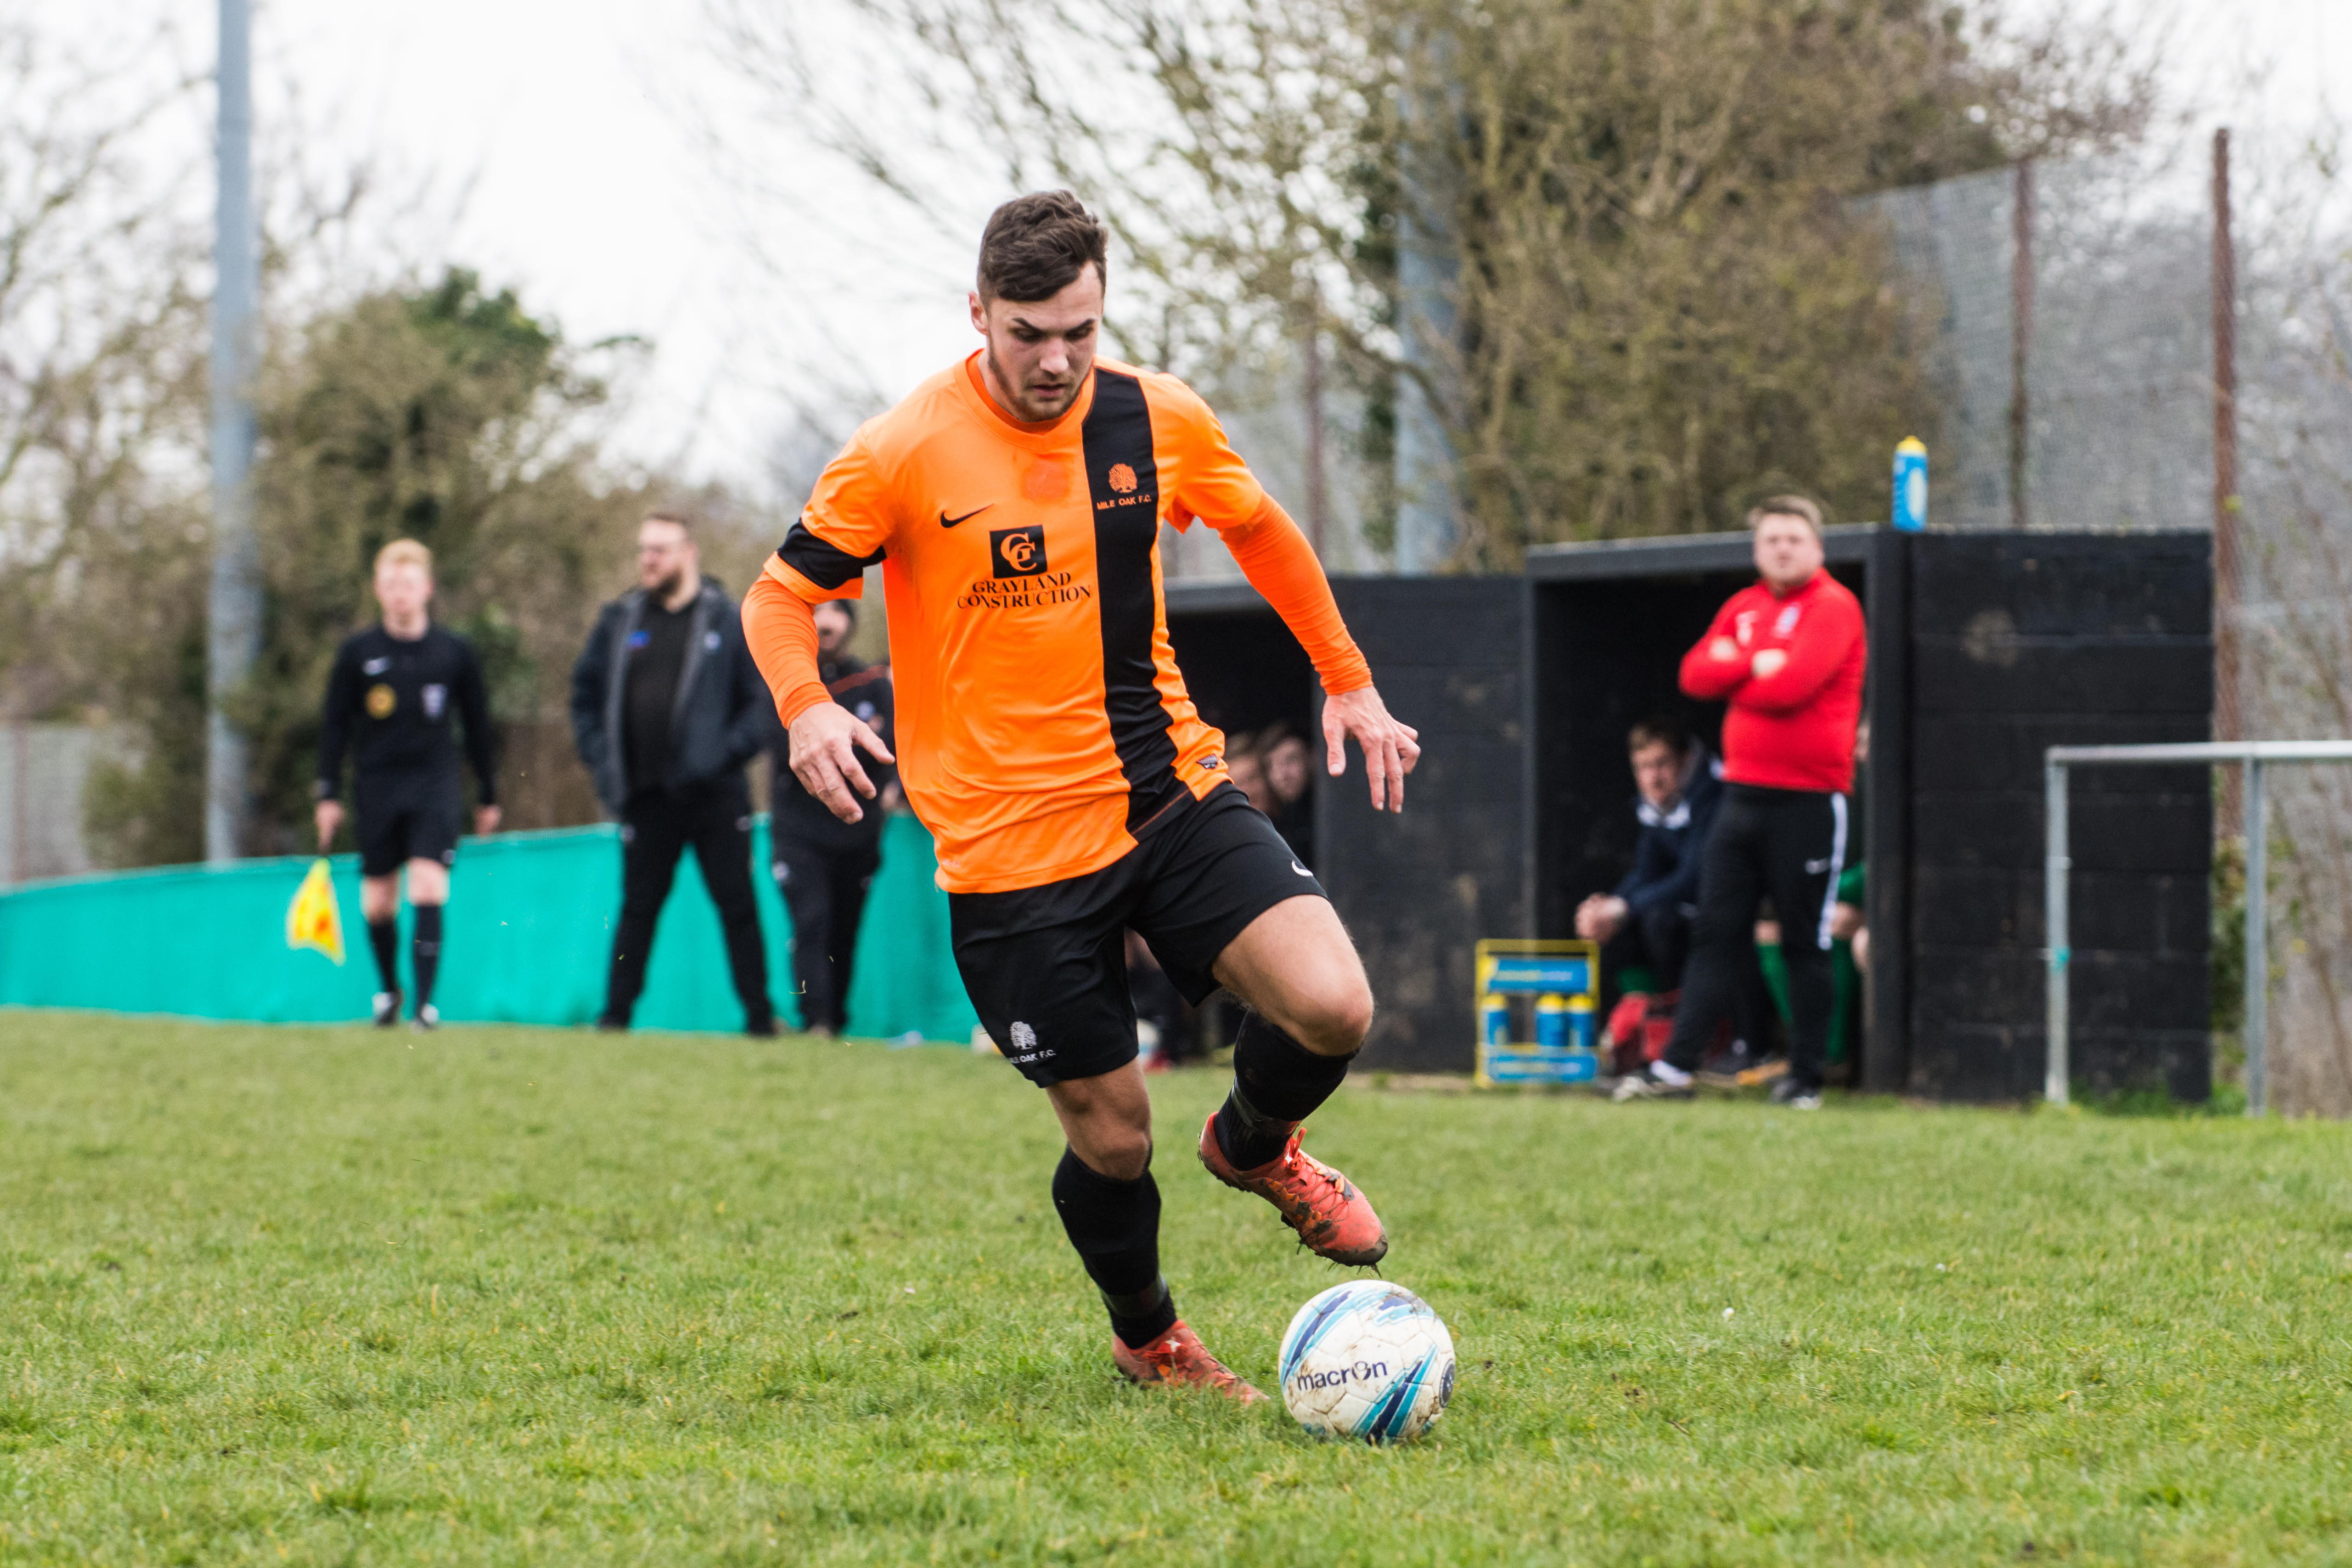 DAVID_JEFFERY Mile Oak FC vs Hailsham Town FC 24.03.18 22